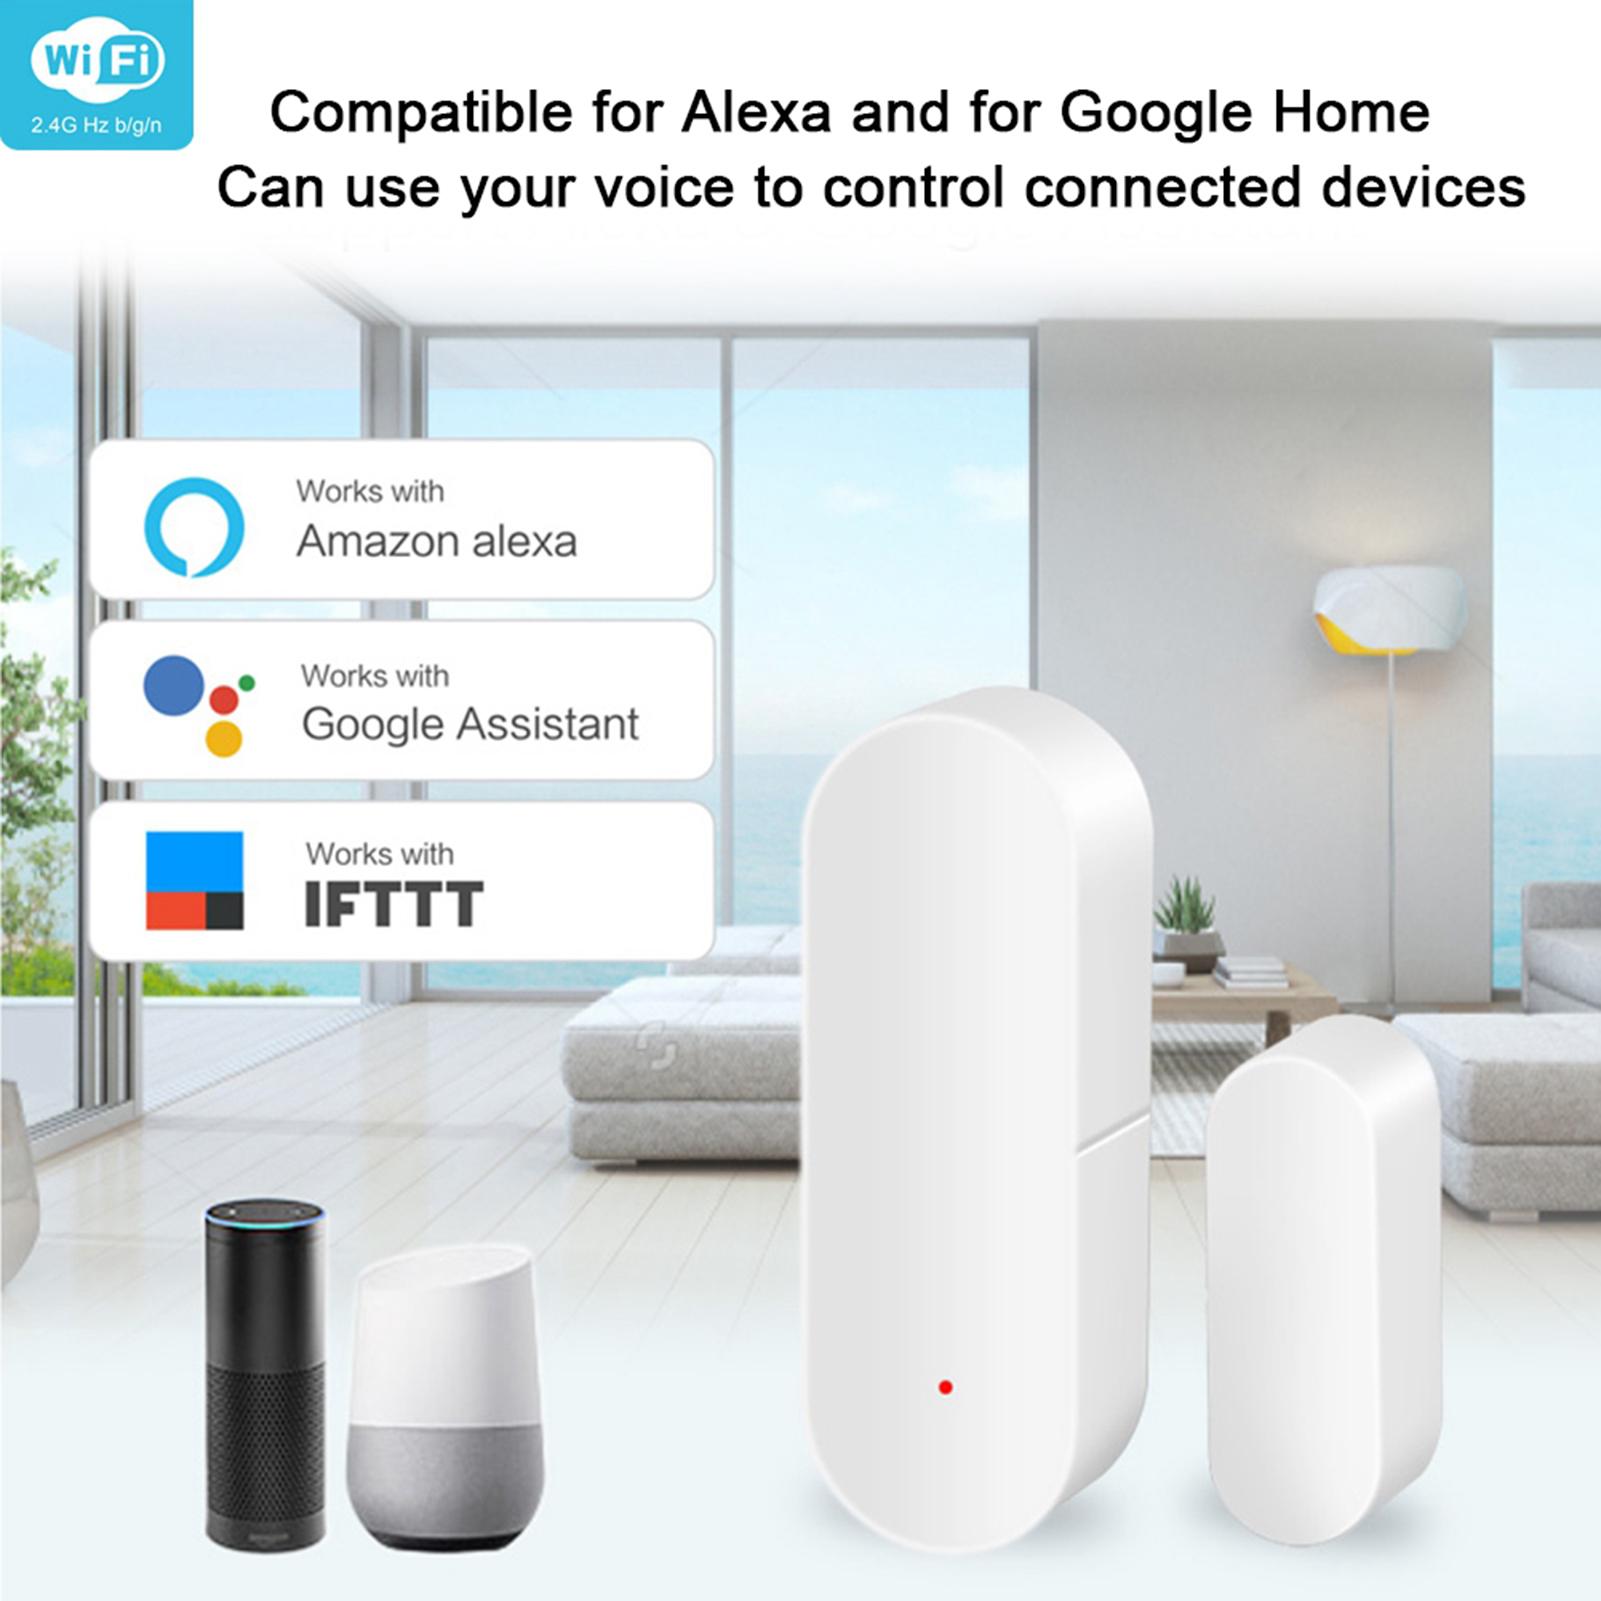 WiFi-Door-Window-Sensor-2-4Ghz-Home-Security-Detector-Support-for-Google-Home thumbnail 39